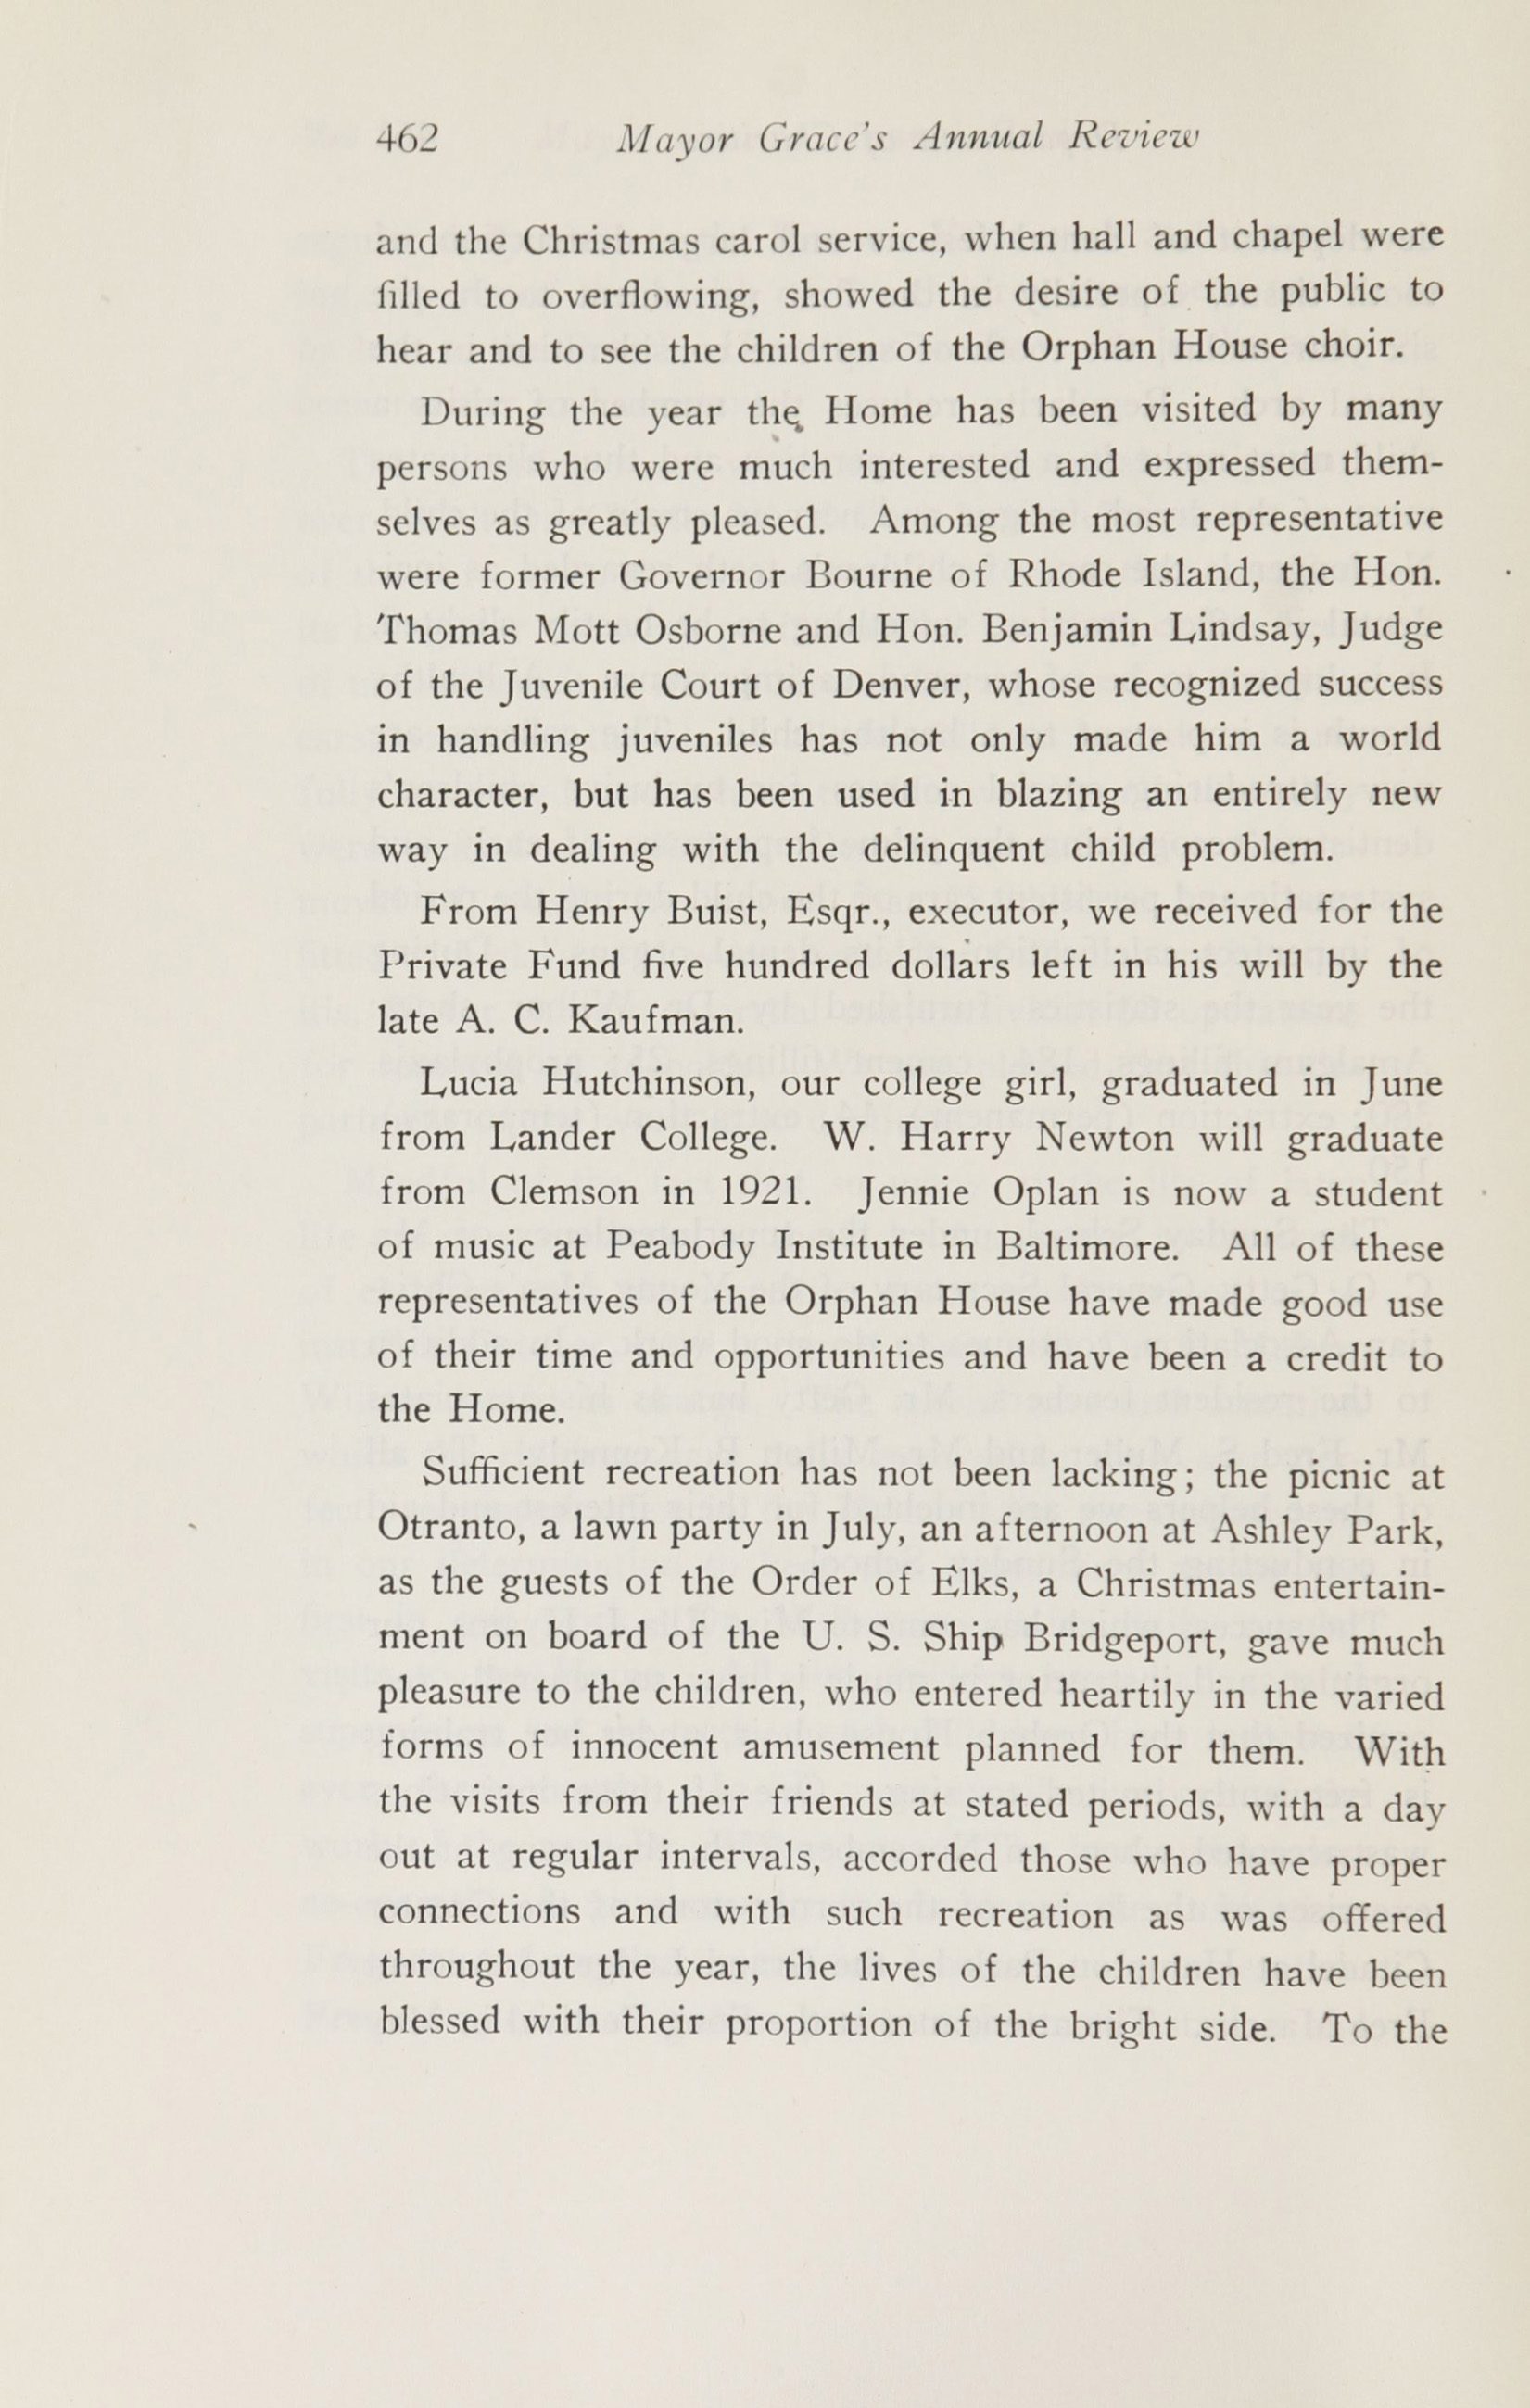 Charleston Yearbook, 1920, page 462